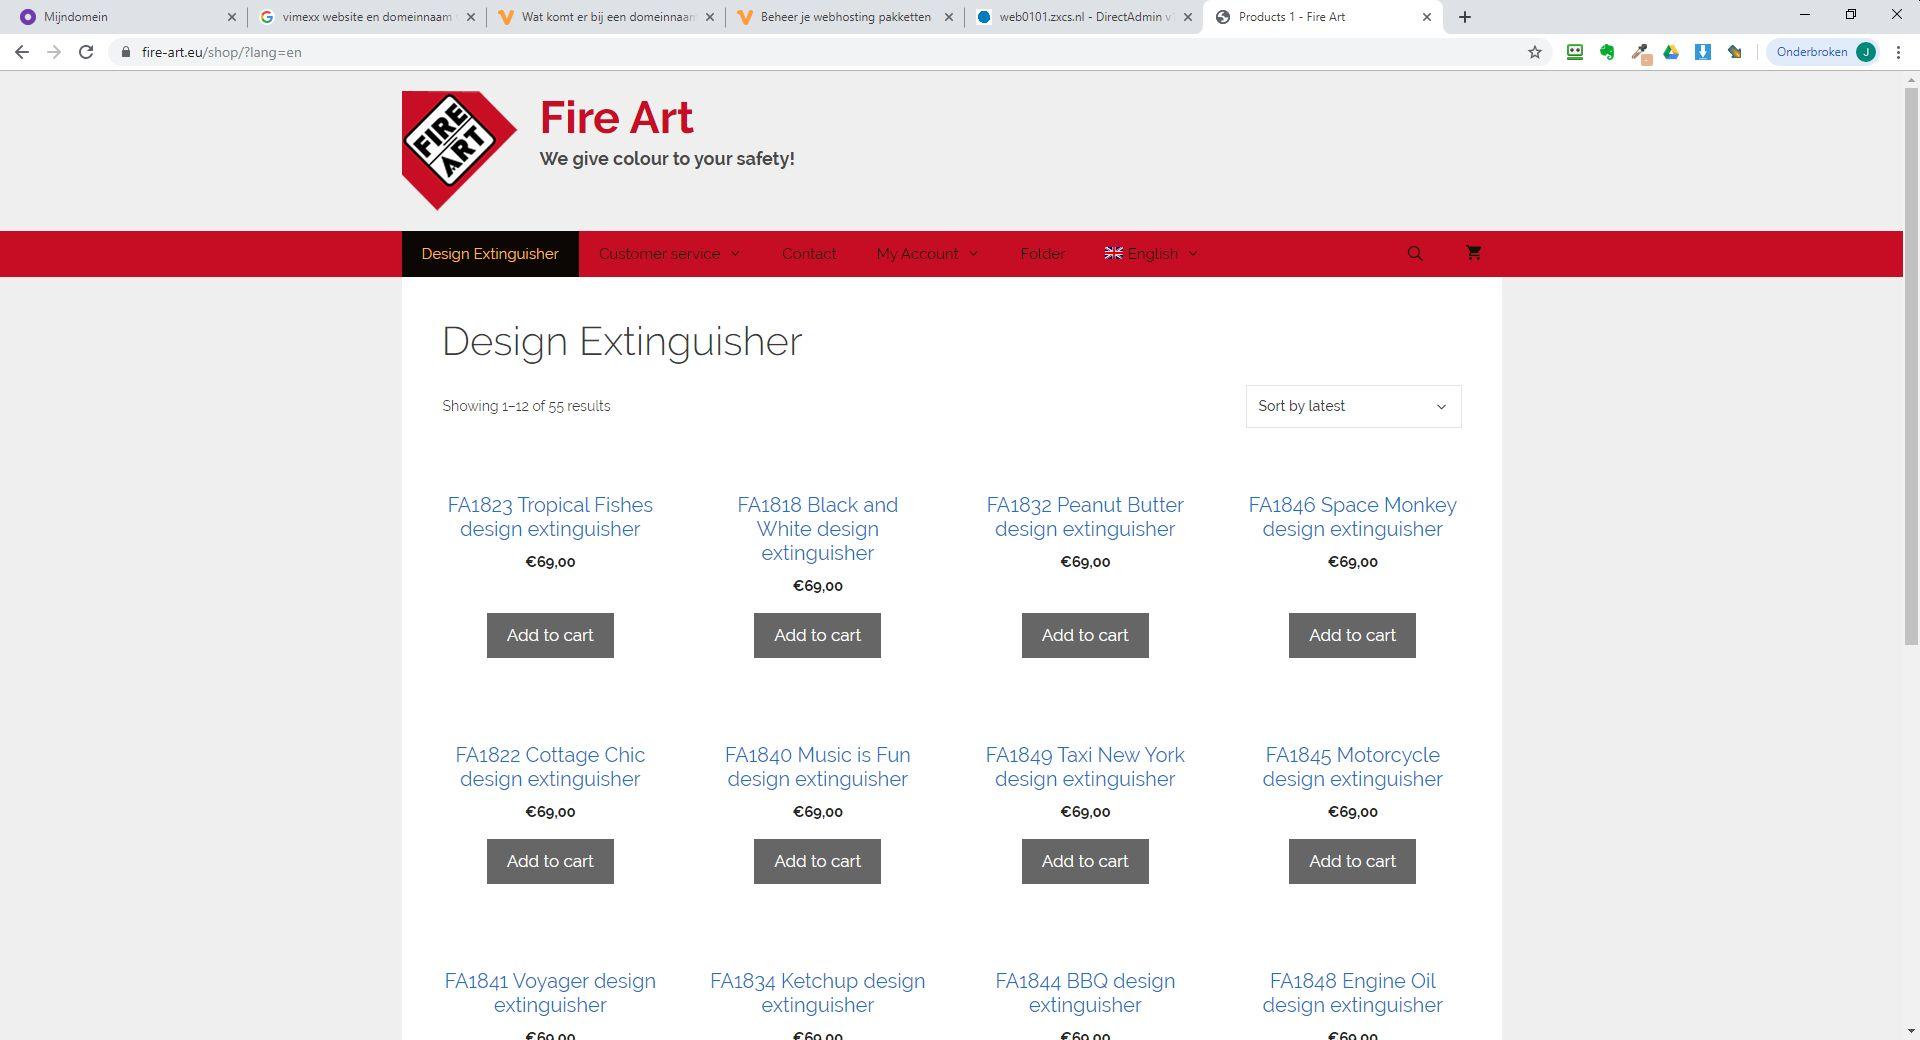 fire-art images not showing.jpg